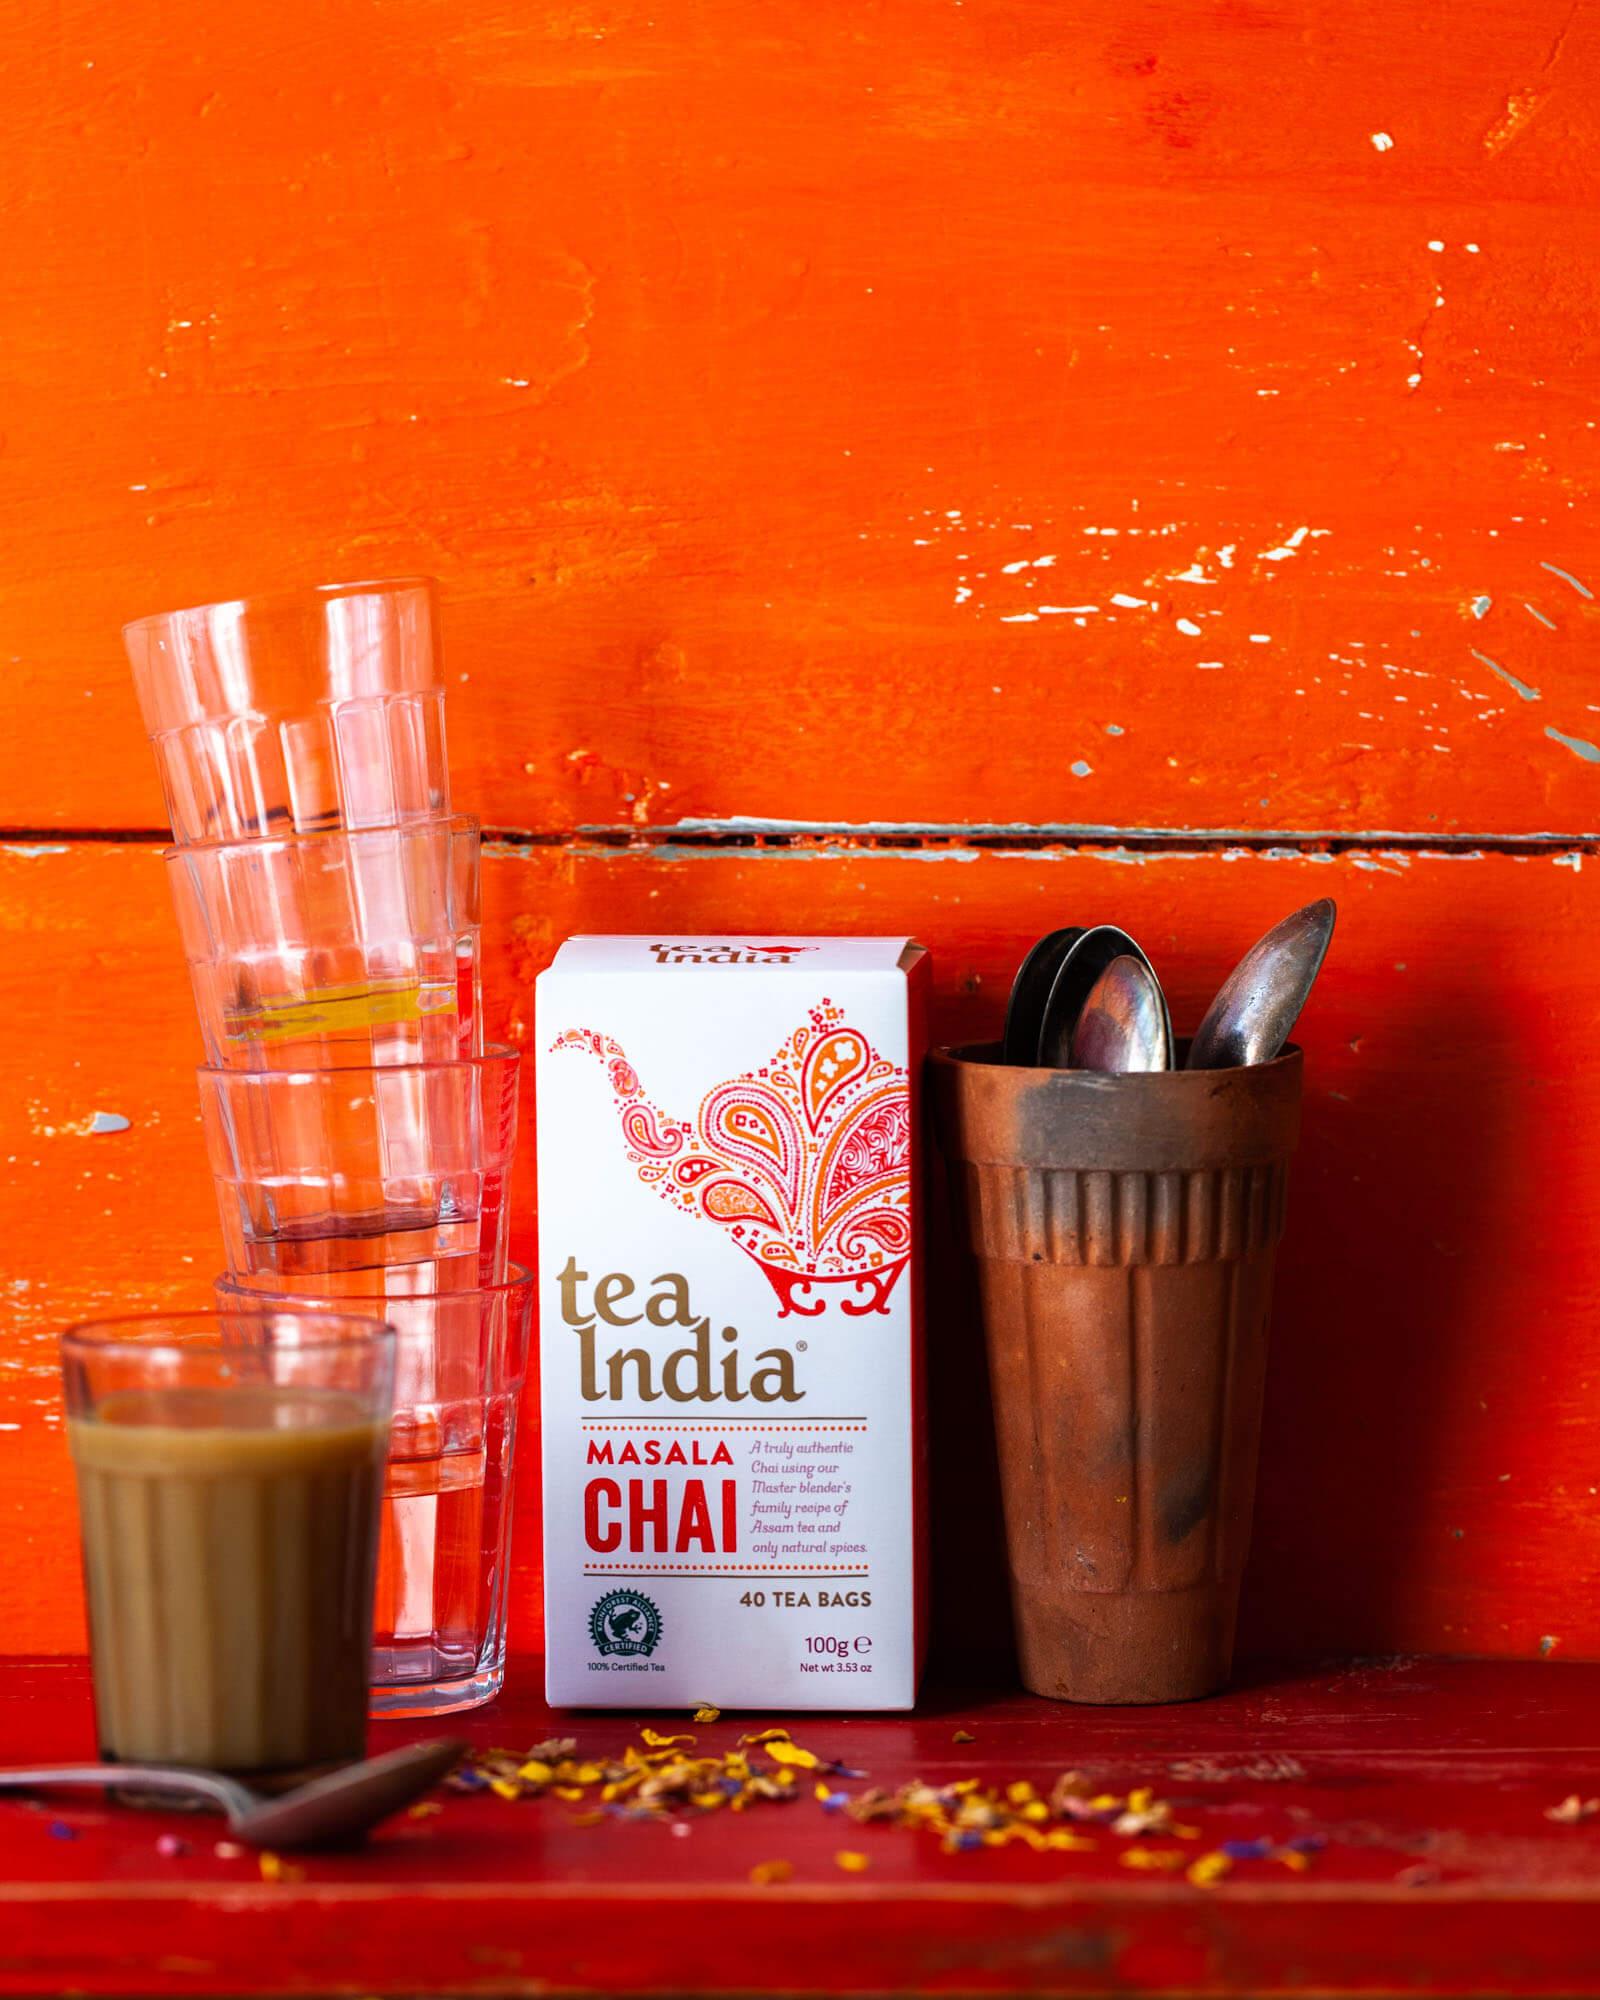 Tea India - Drink photography-Lara Jane Thorpe